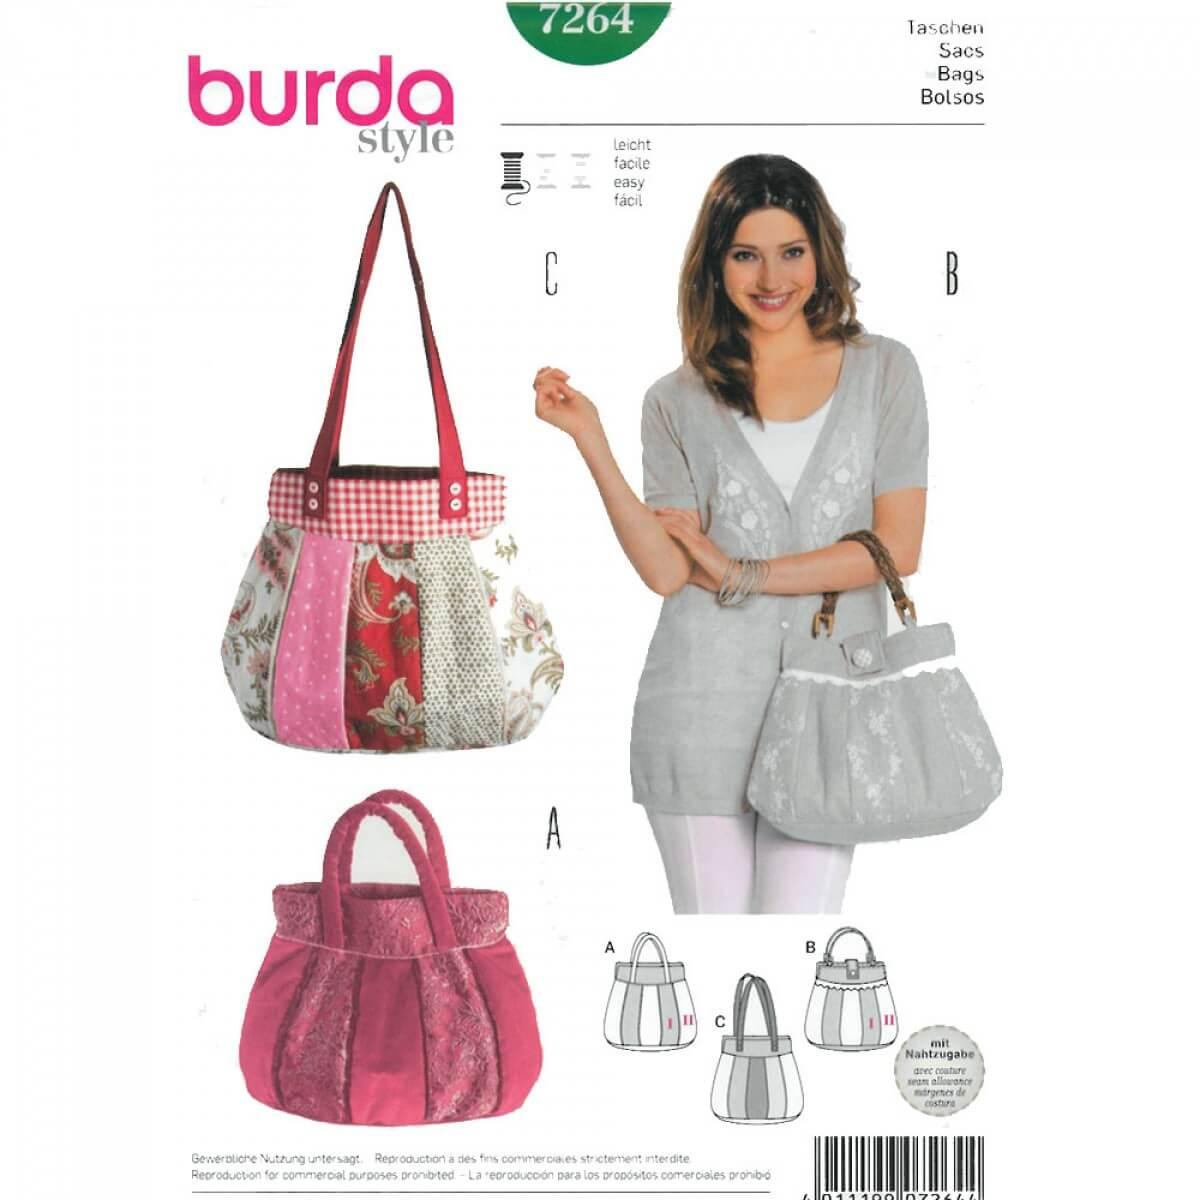 Patron couture sac femme patron couture sac femme patron couture sac femme - Couture sac a main ...